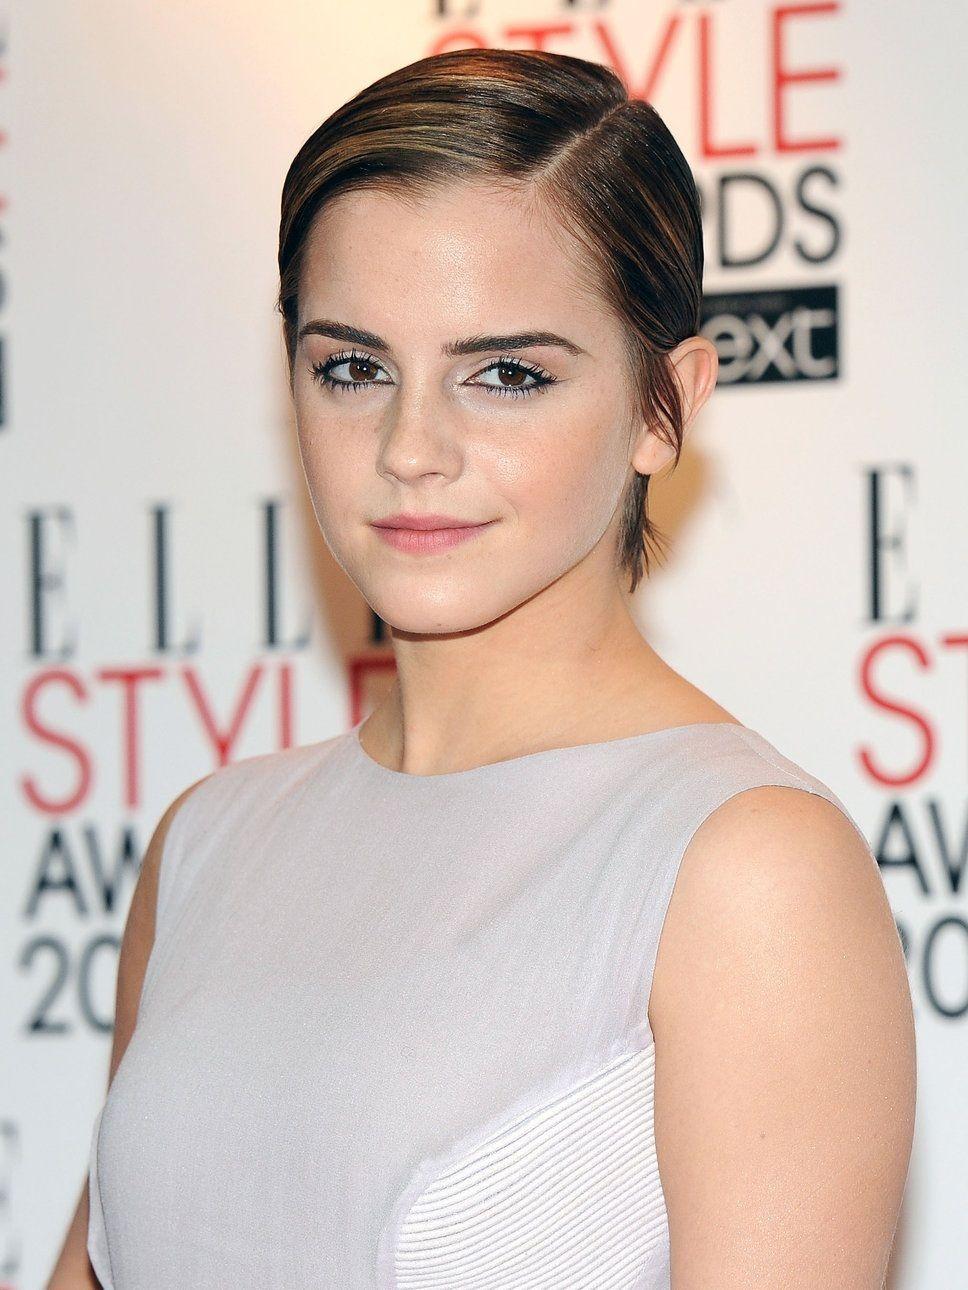 Emma Watson looking Fabulous in short hairs Short hair